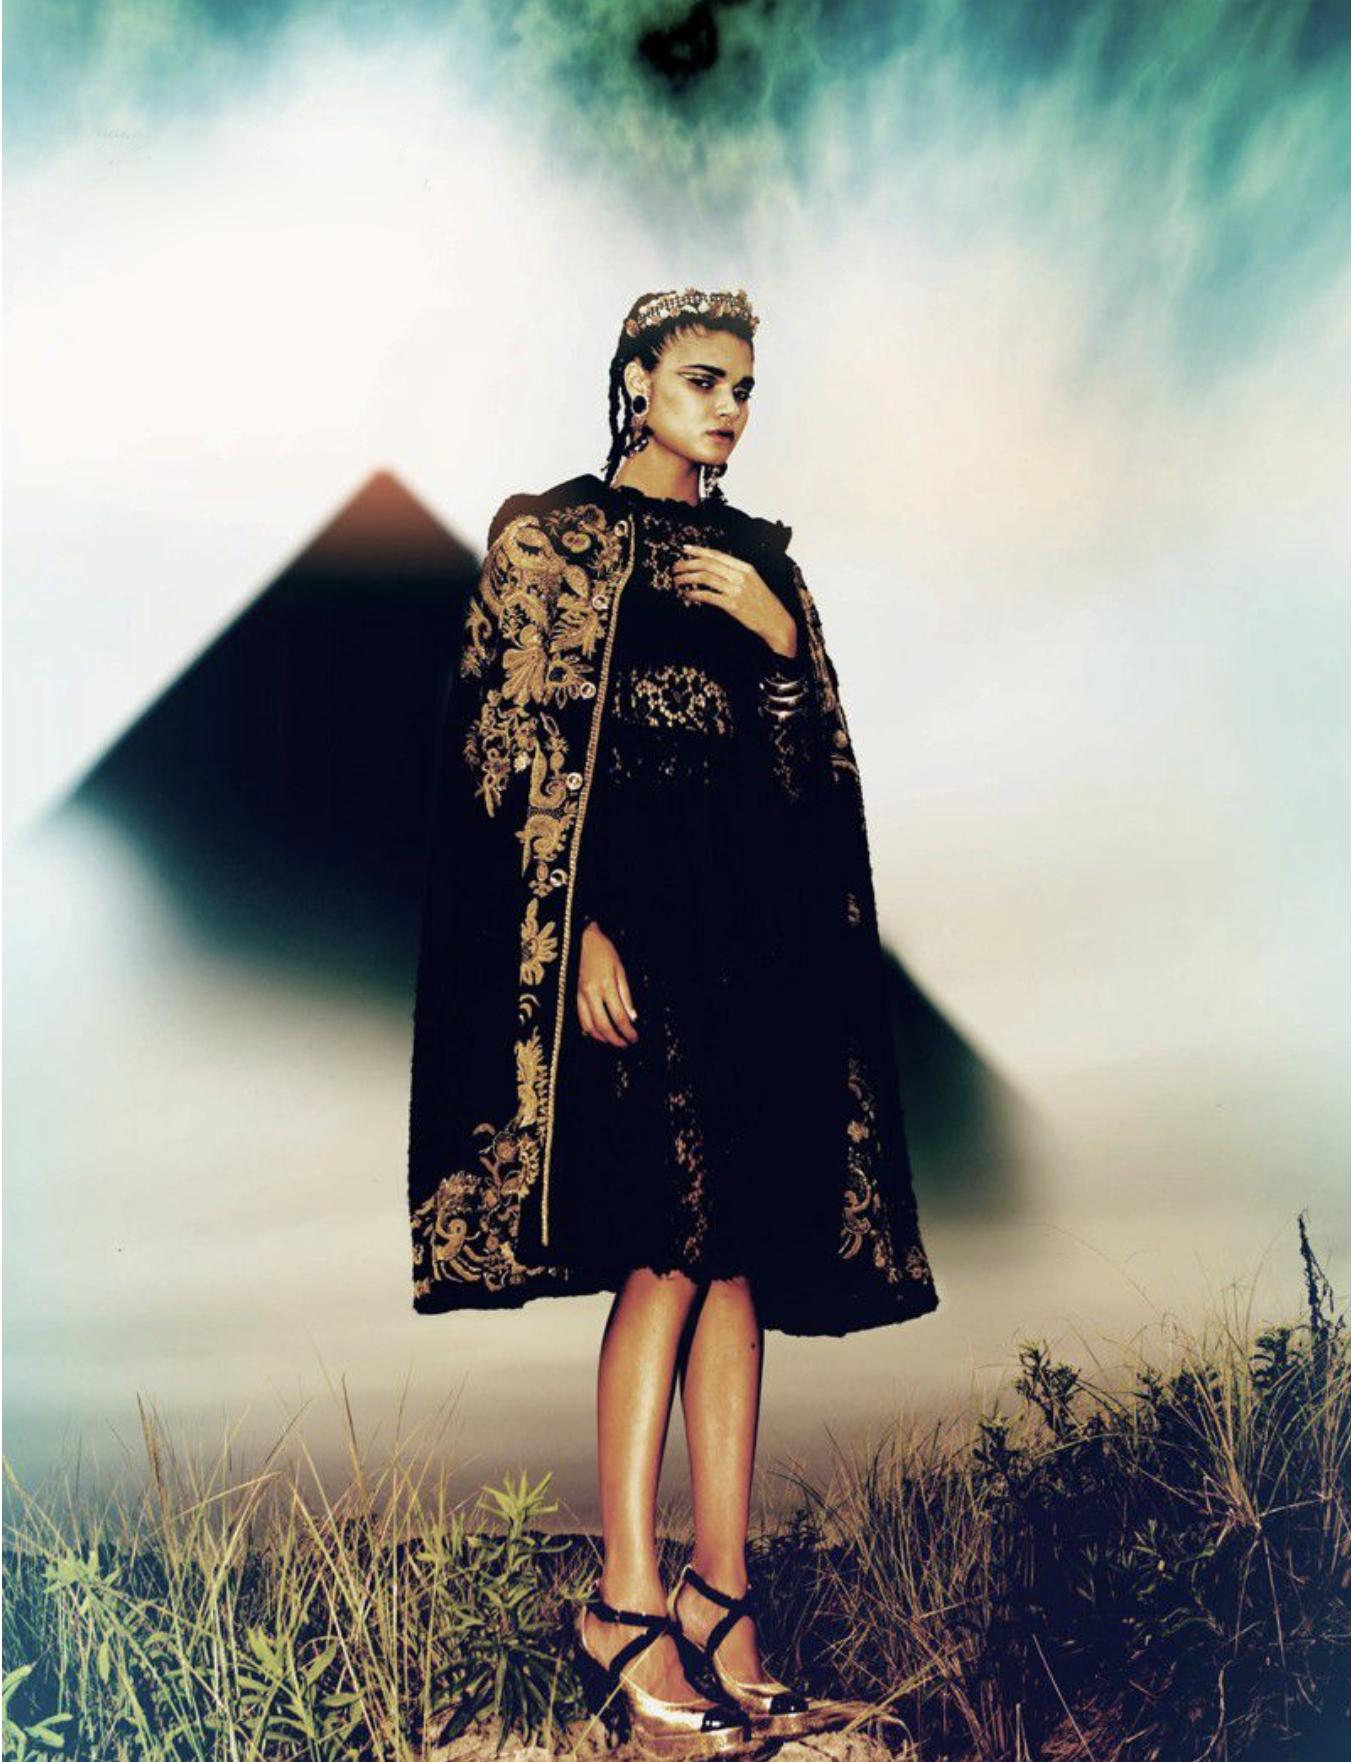 Daniela Braga by Michael Donovan for Vision China